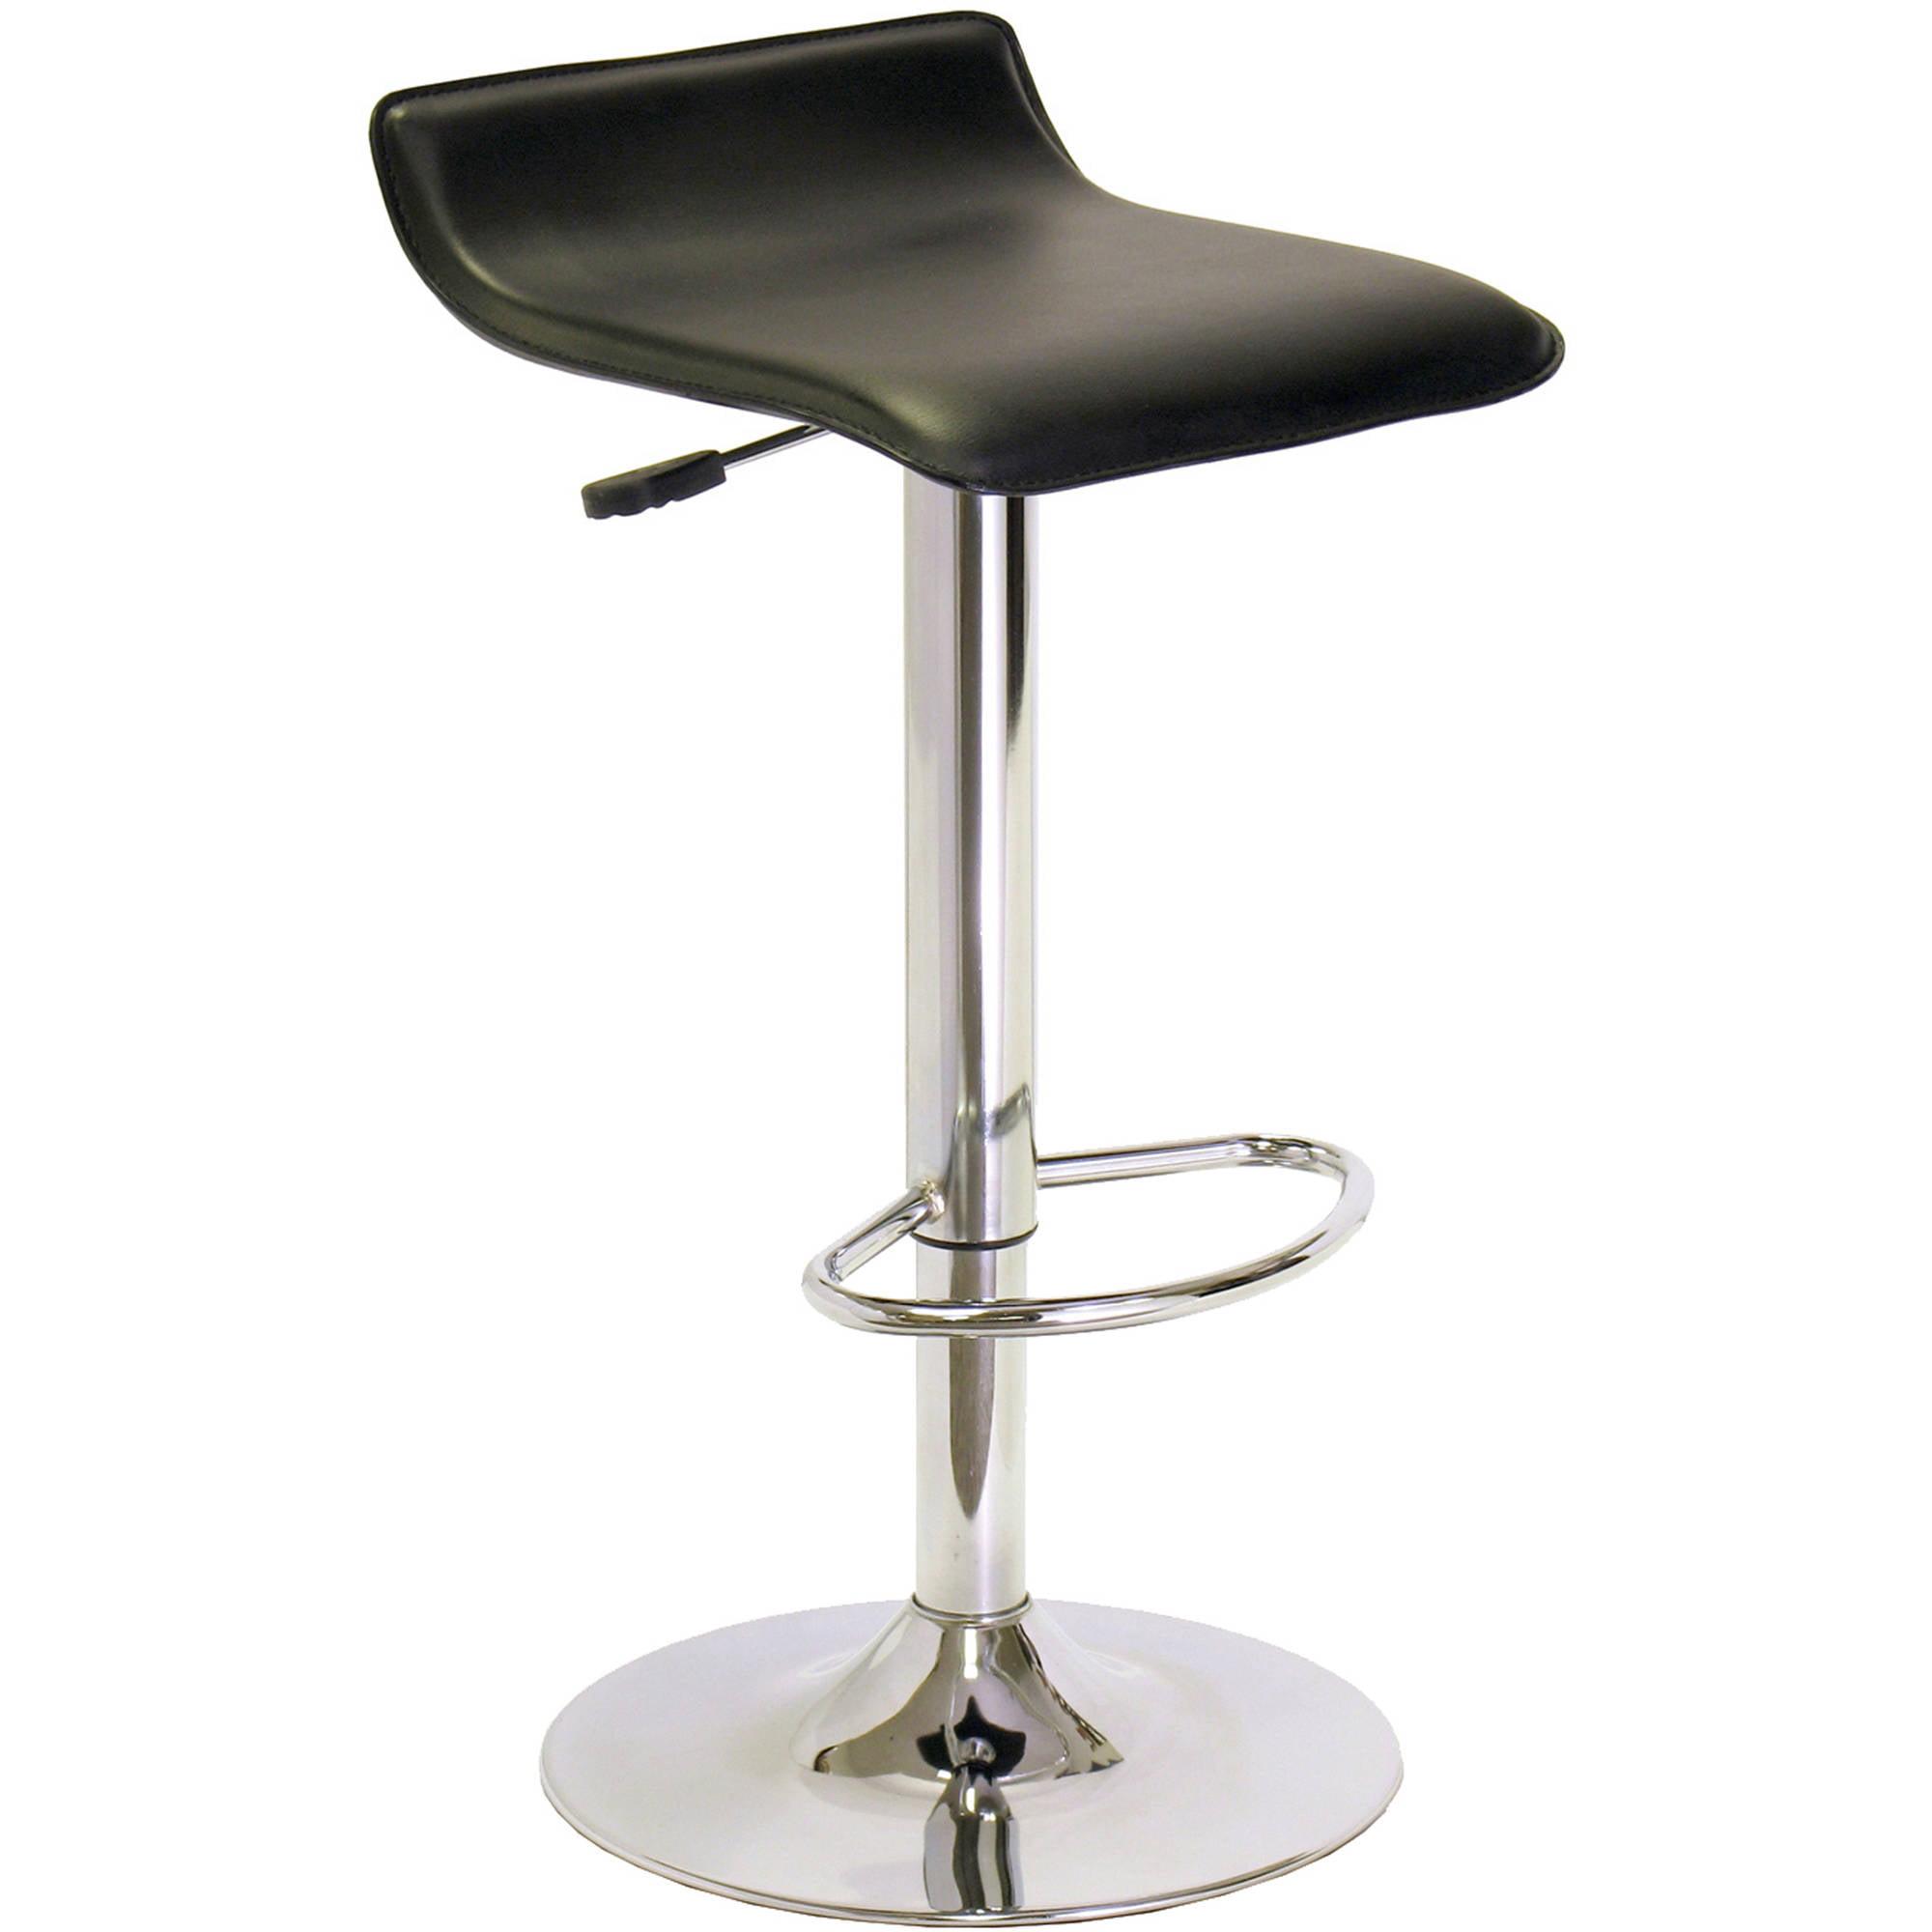 Spectrum Curved Seat Airlift Stool Walmartcom : 99b352b9 4586 4d65 a91f fa0a2631511019d25d3c49f4eb7275d79bfdcd253544d from www.walmart.com size 2000 x 2000 jpeg 134kB